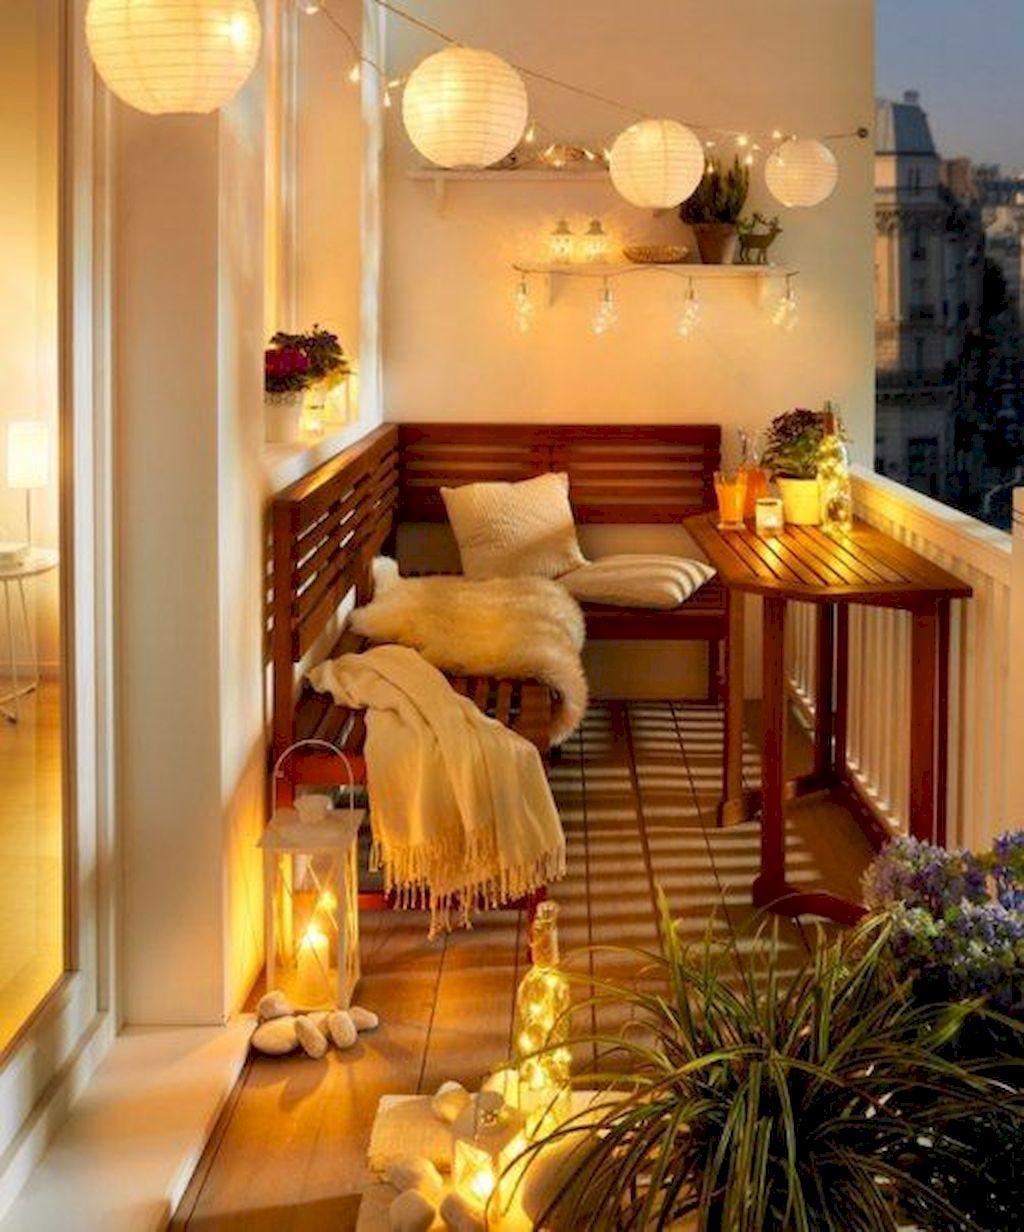 65 Cozy Apartment Balcony Decorating Ideas #apartmentbalconydecorating